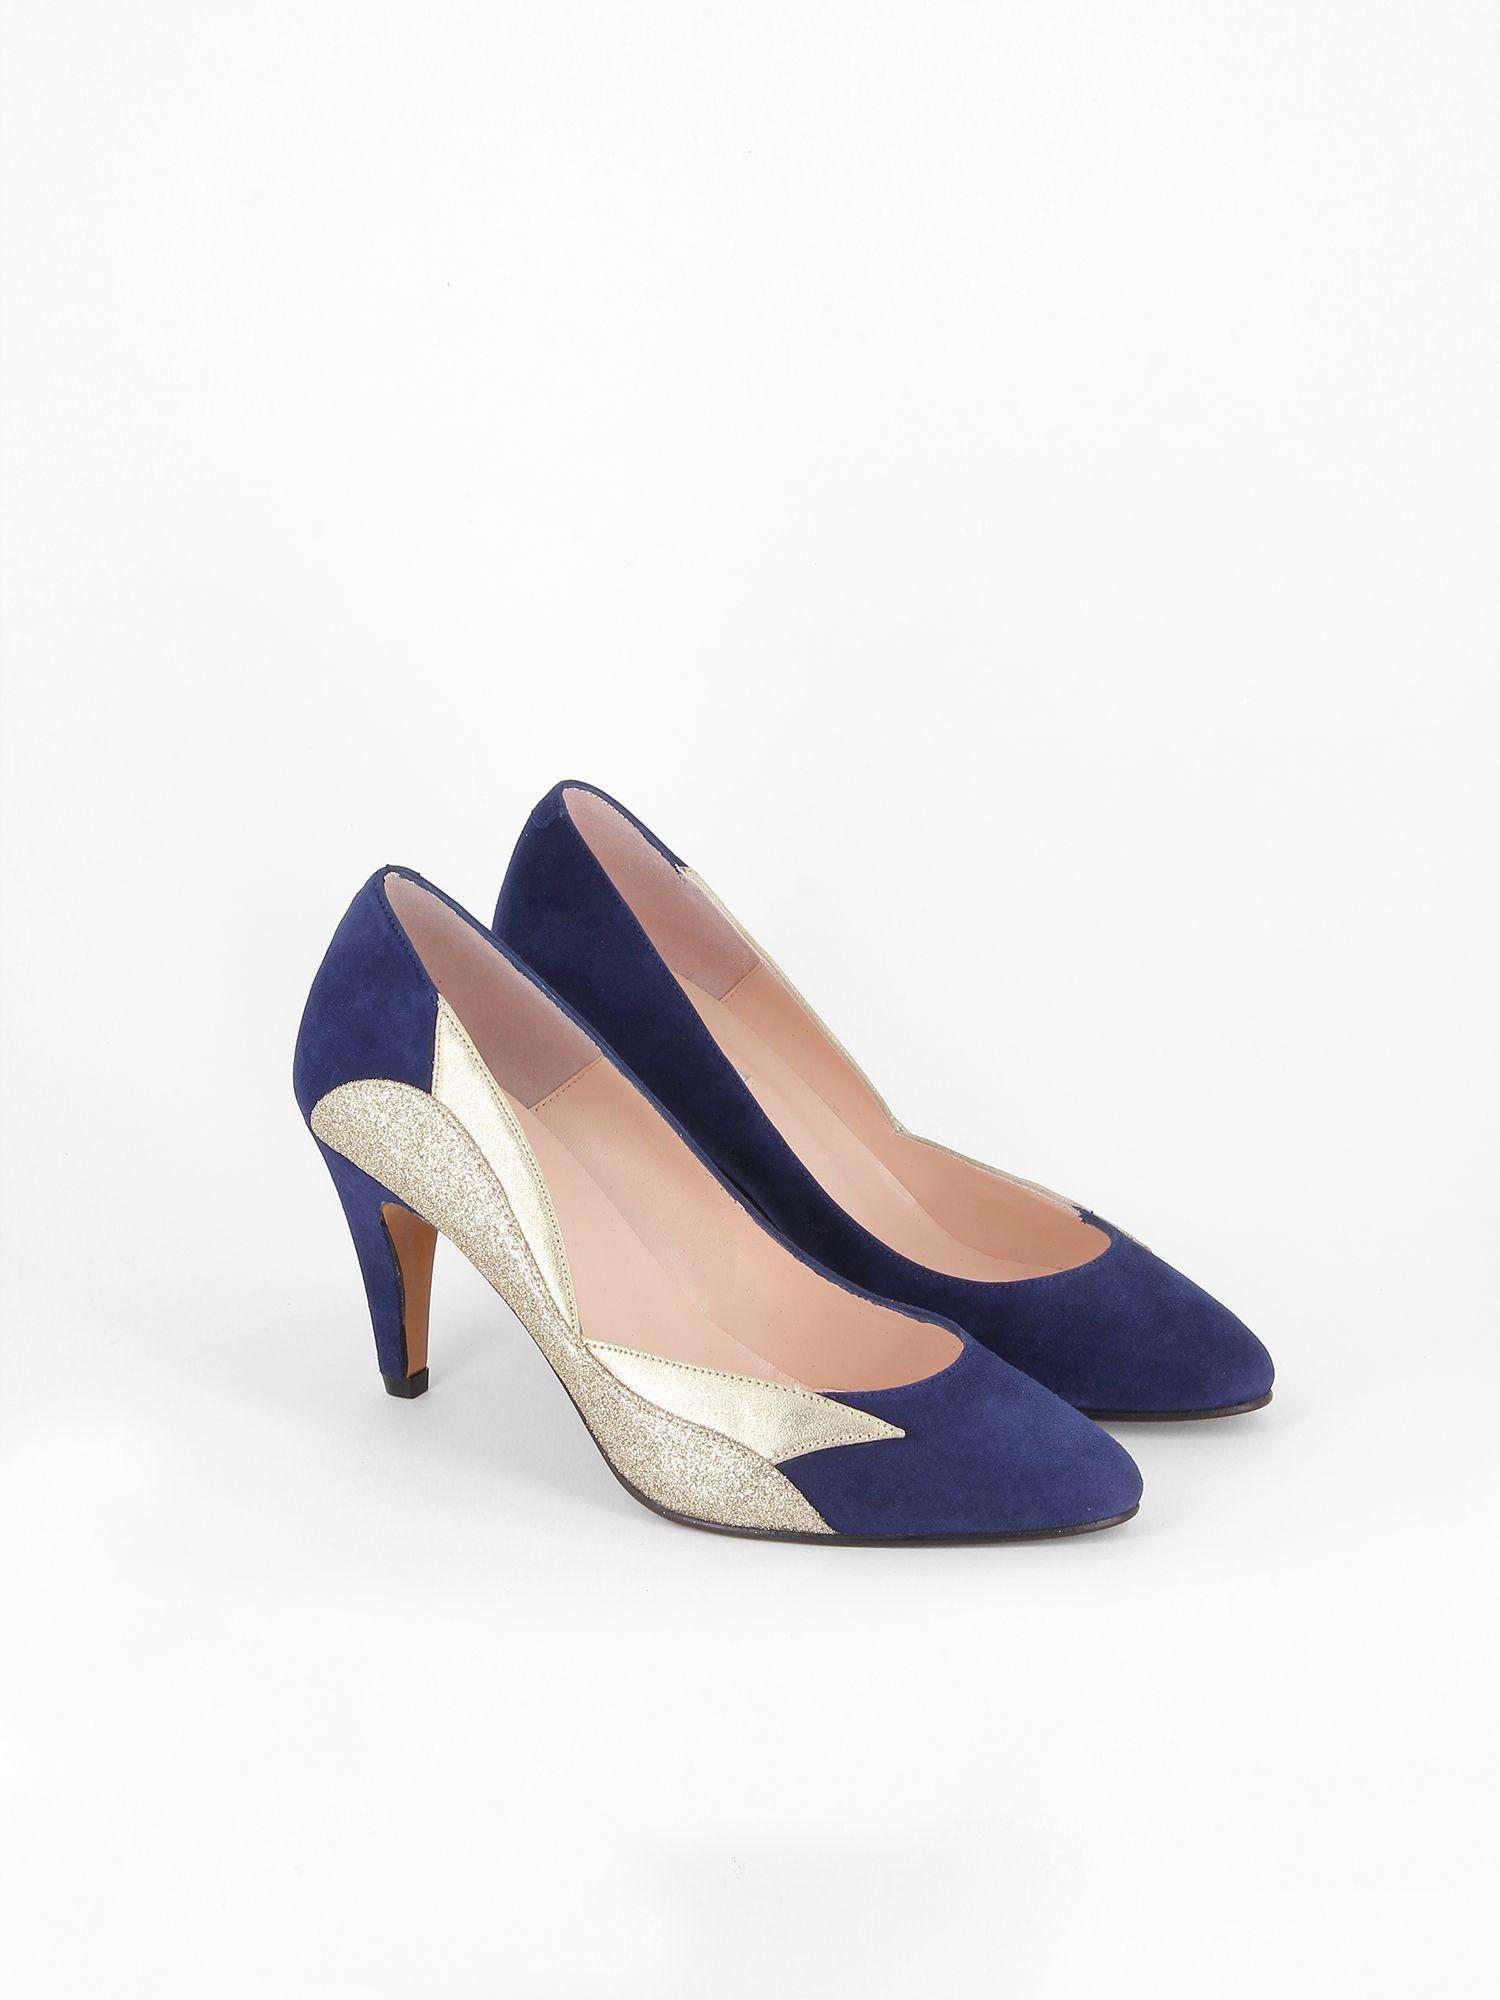 50af035fdab908 Patricia Blanchet Escarpin Bleu, Mariage Bleu Marine, Chaussures Bleues,  Belle Chaussure, Chaussures